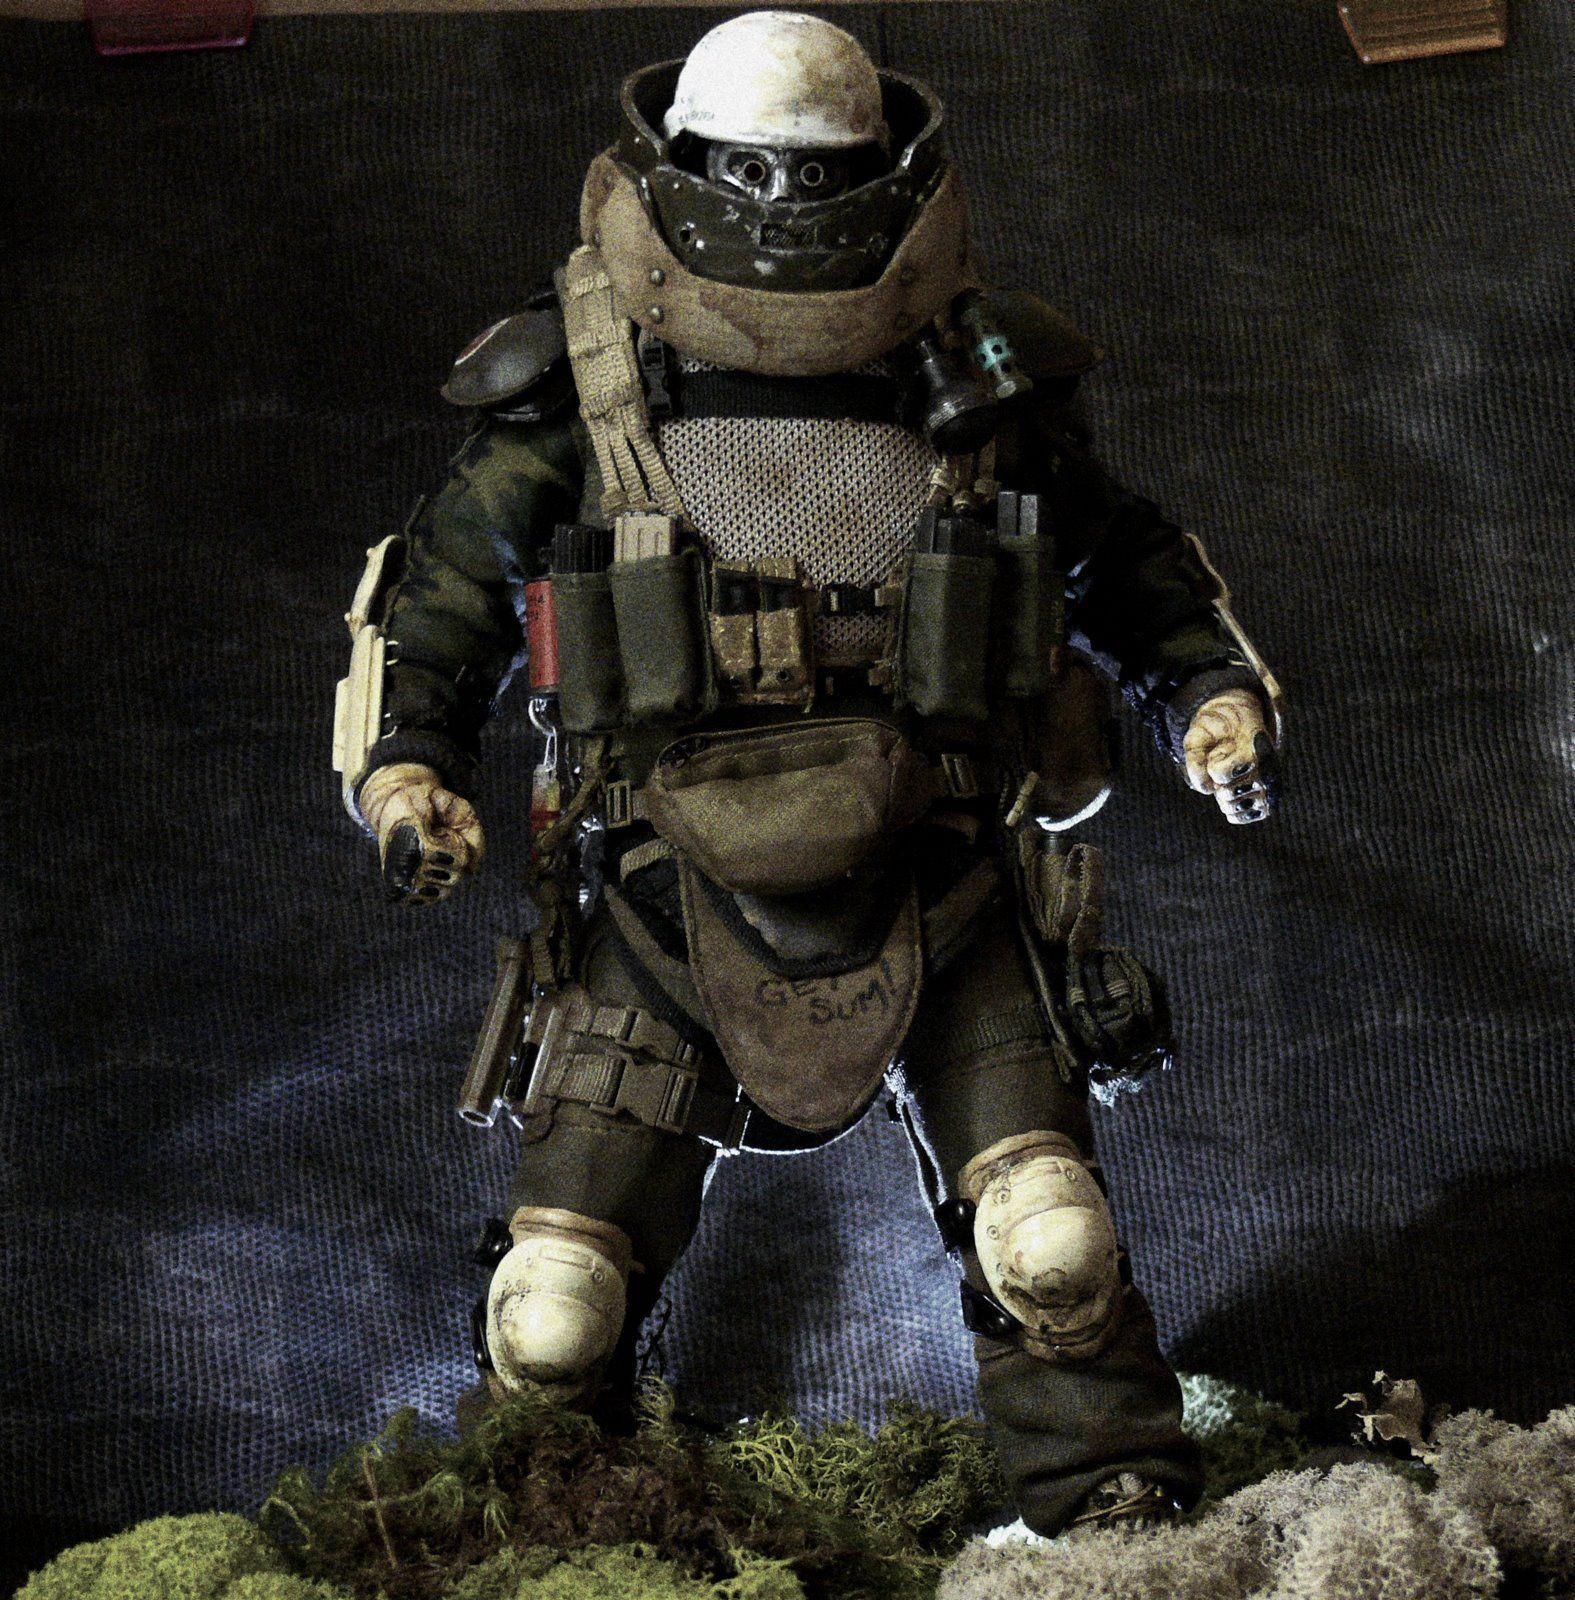 Juggernaut Cod Resim Bul Call Of Duty Call Of Duty Juggernaut Resimleri Ve Call Of Duty Tactical Armor Mai Sakurajima